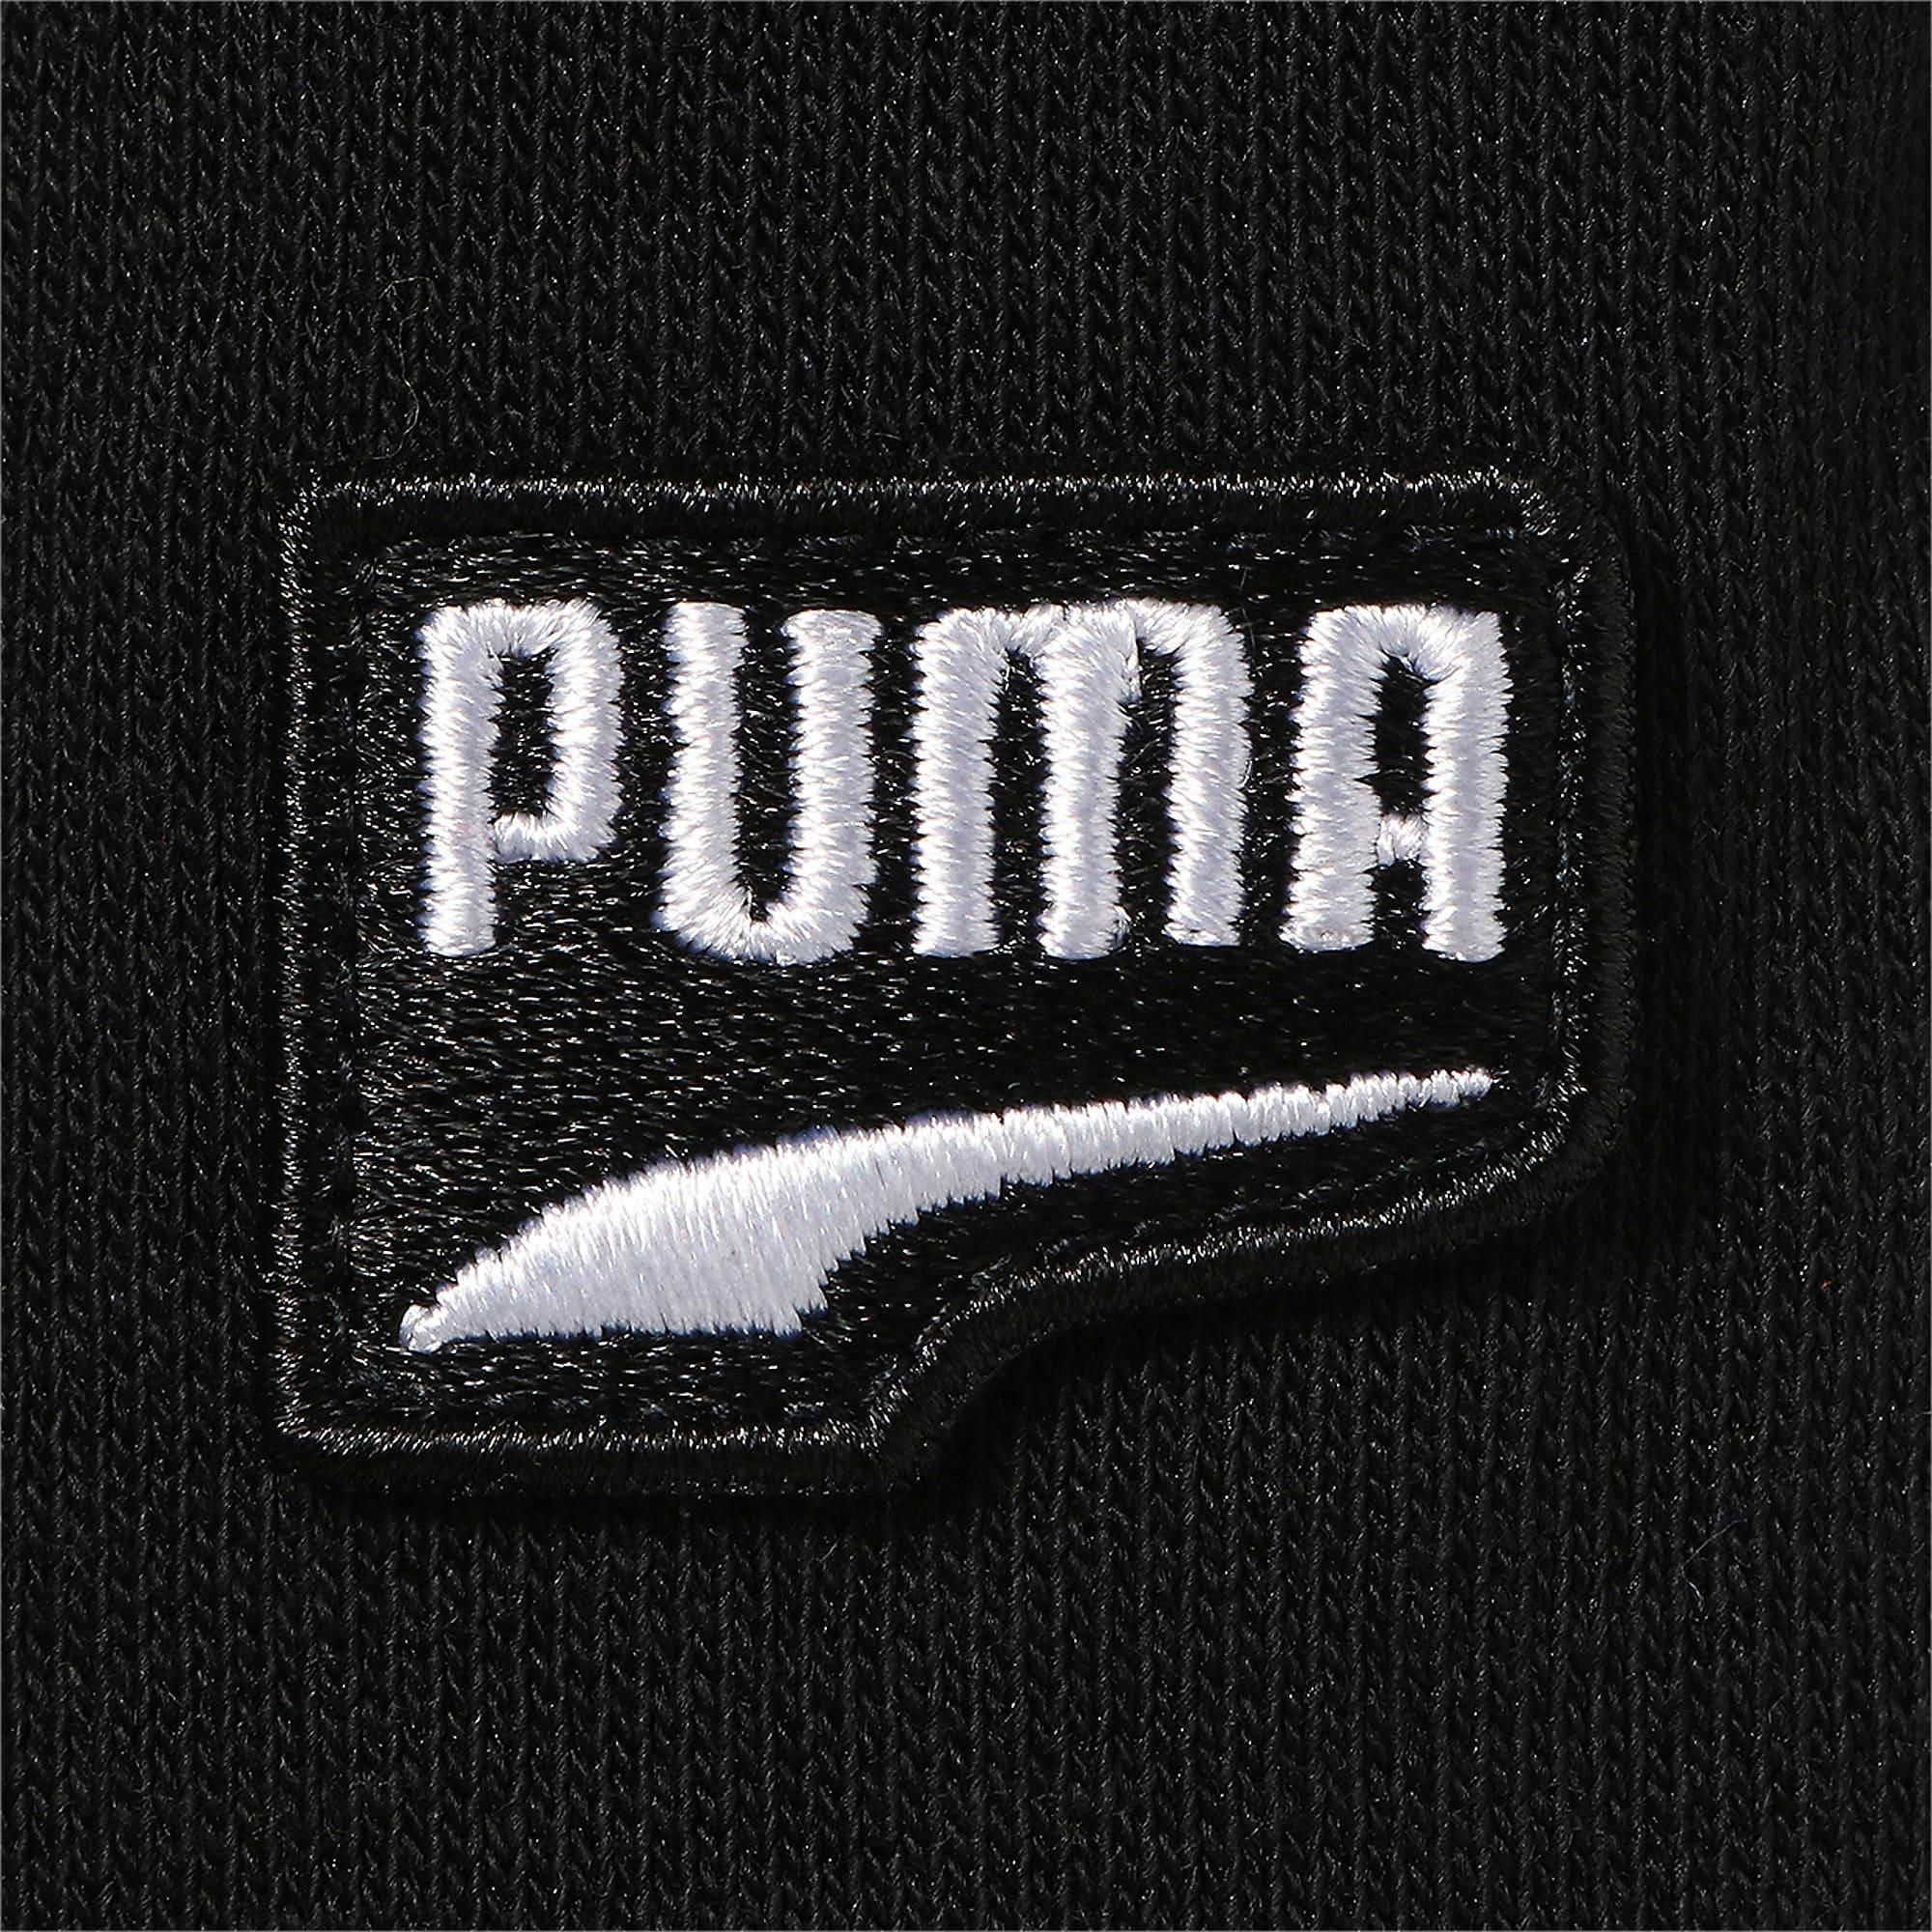 Thumbnail 7 of ダウンタウン ウィメンズ スウェットパンツ, Puma Black, medium-JPN